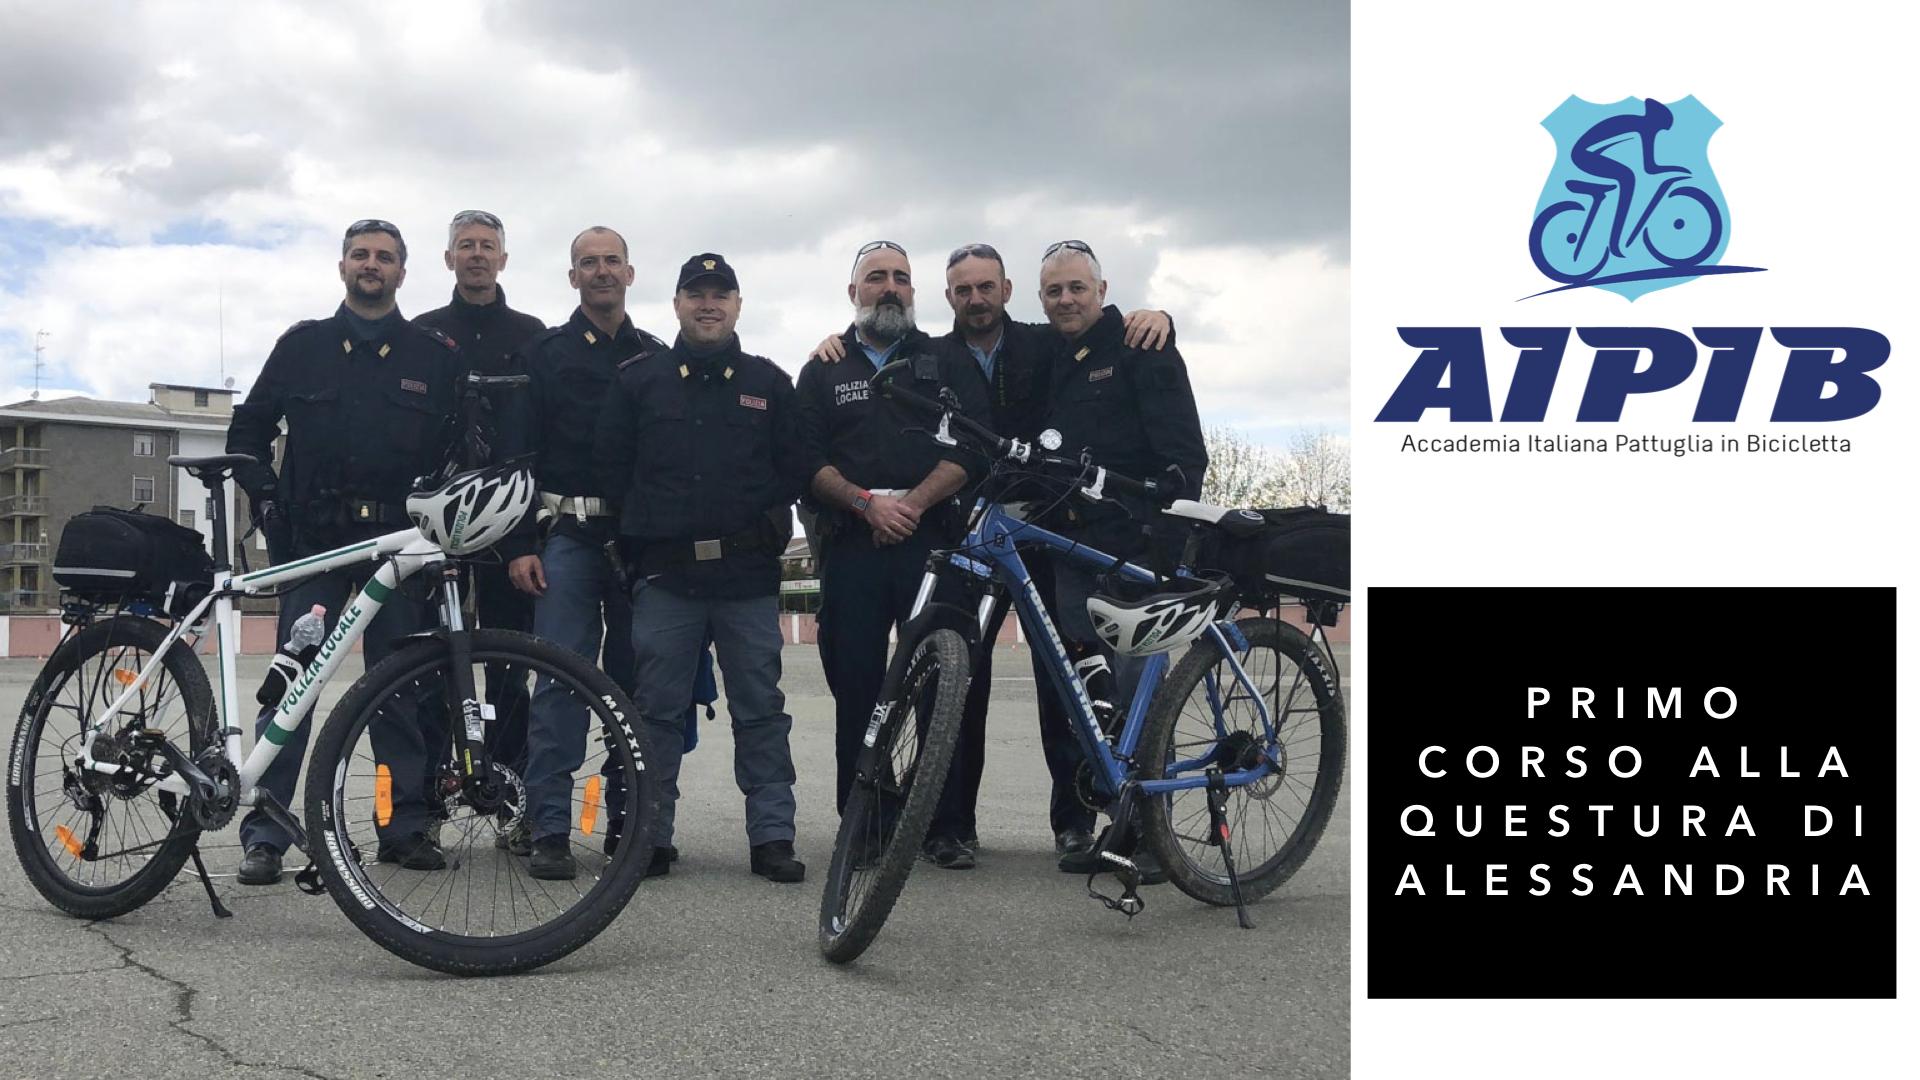 corso bike patrol questura alessandria